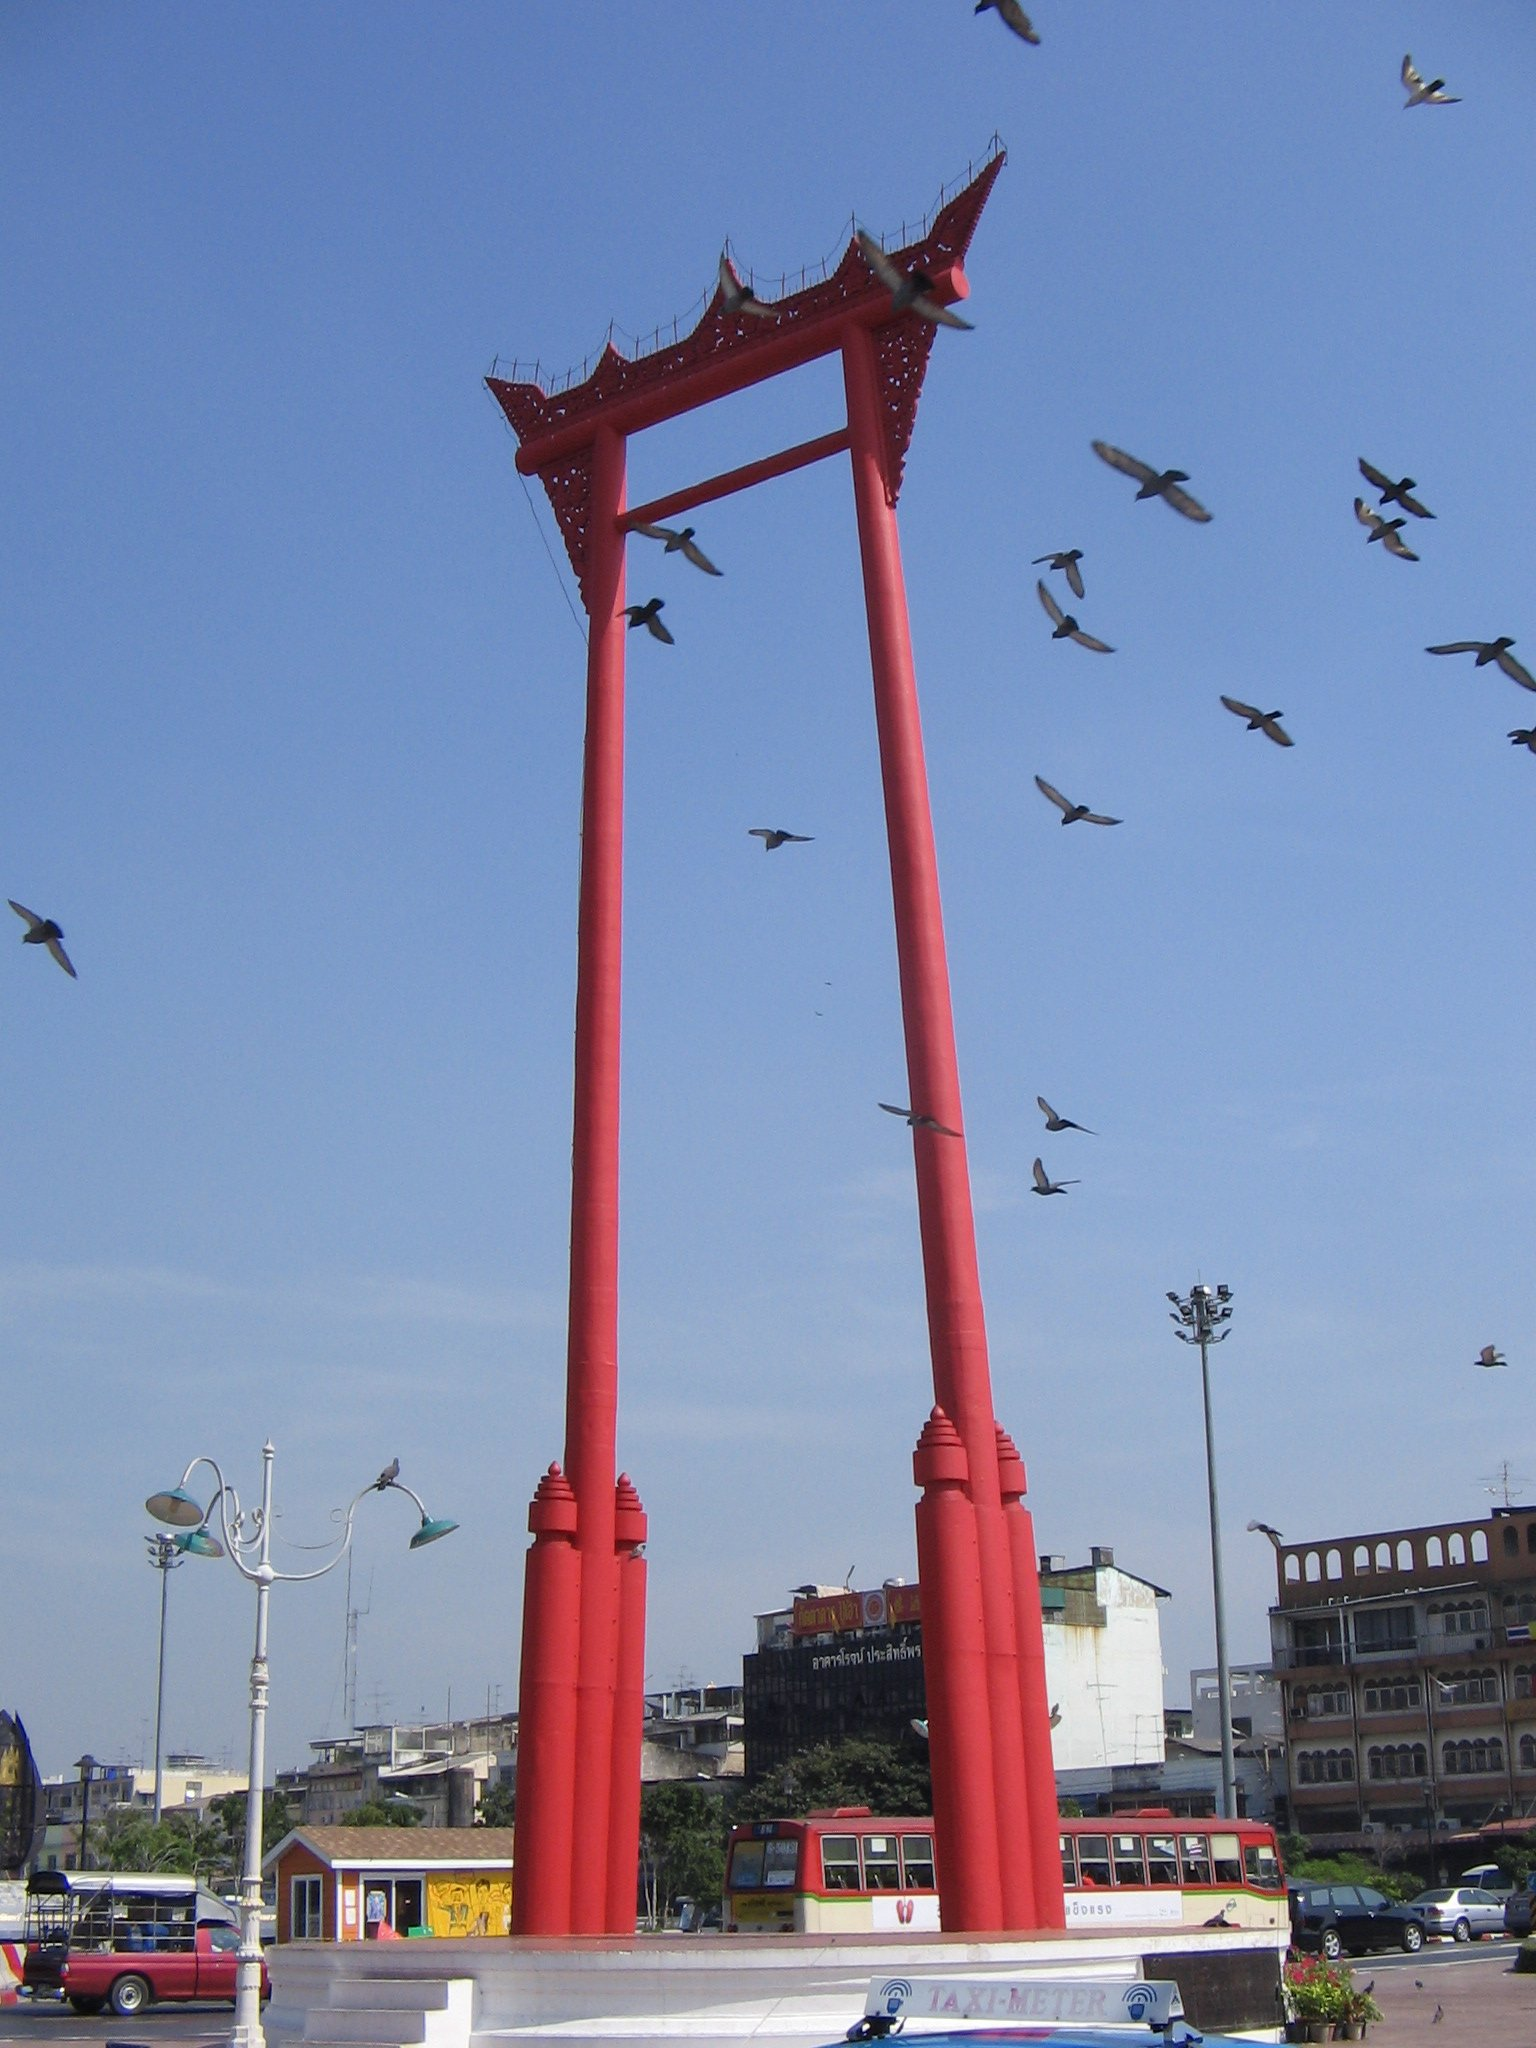 File:Big swing bangkok.JPG - Wikimedia Commons